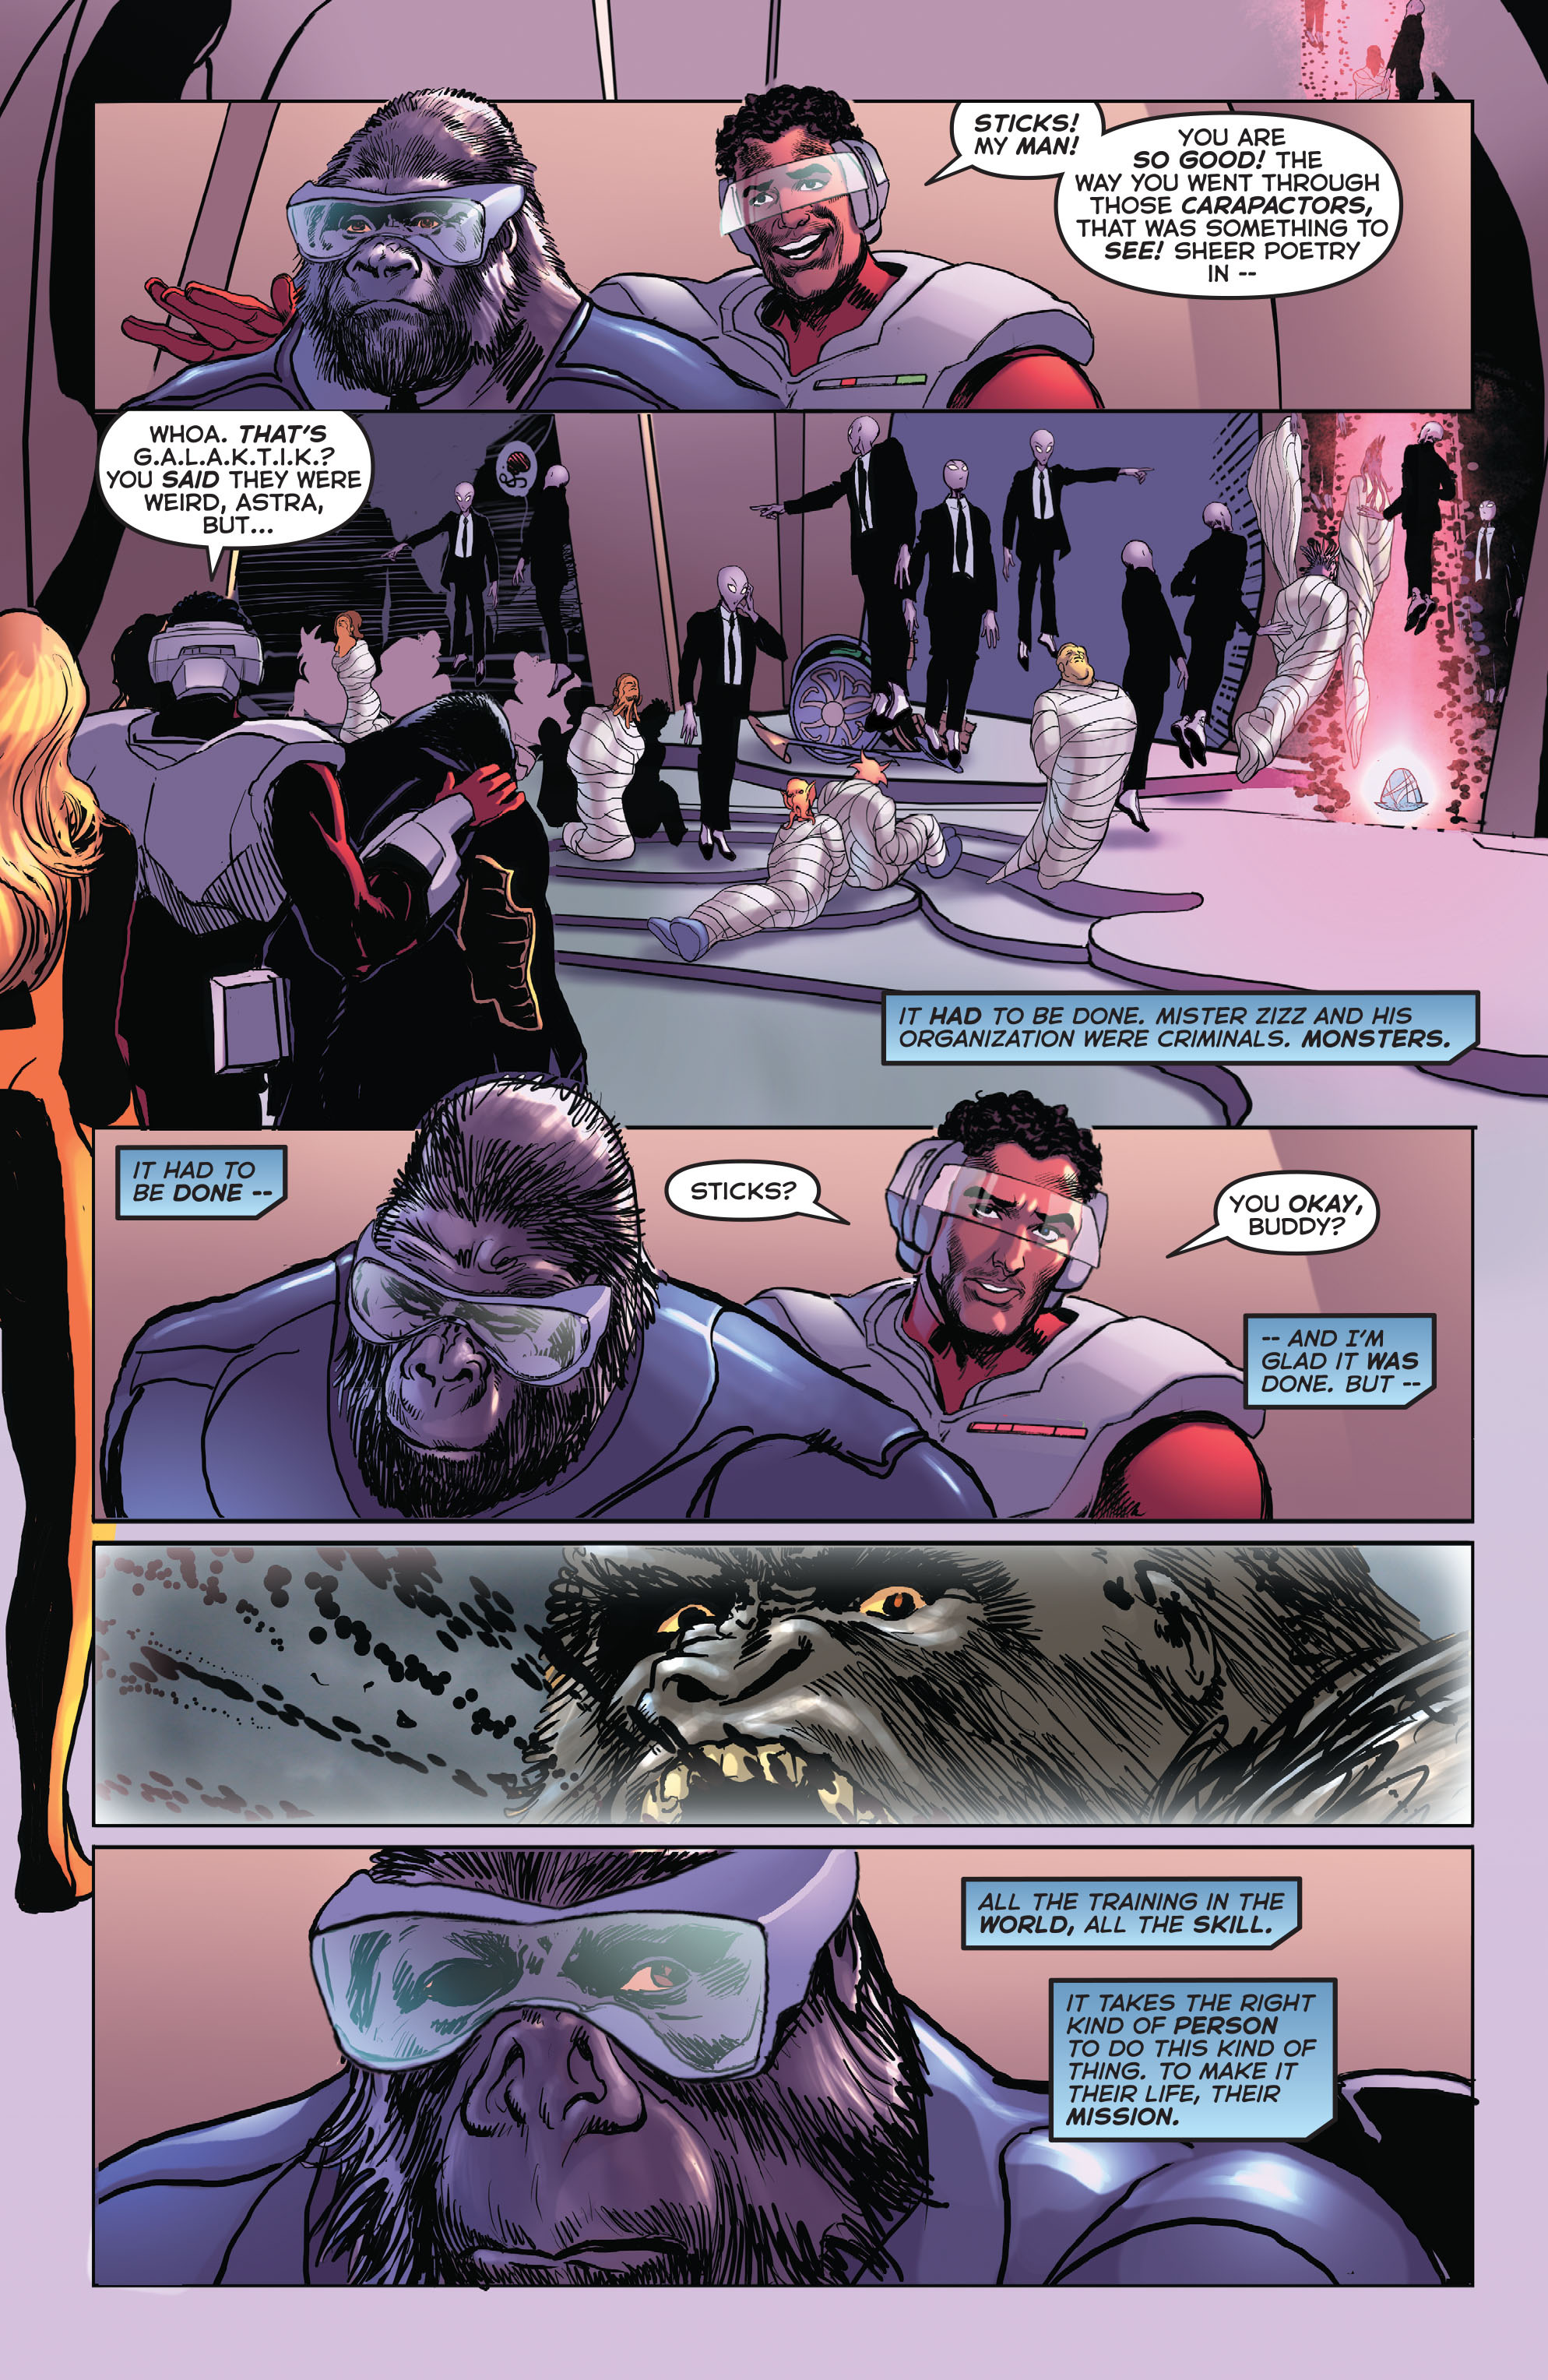 Read online Astro City comic -  Issue #24 - 9